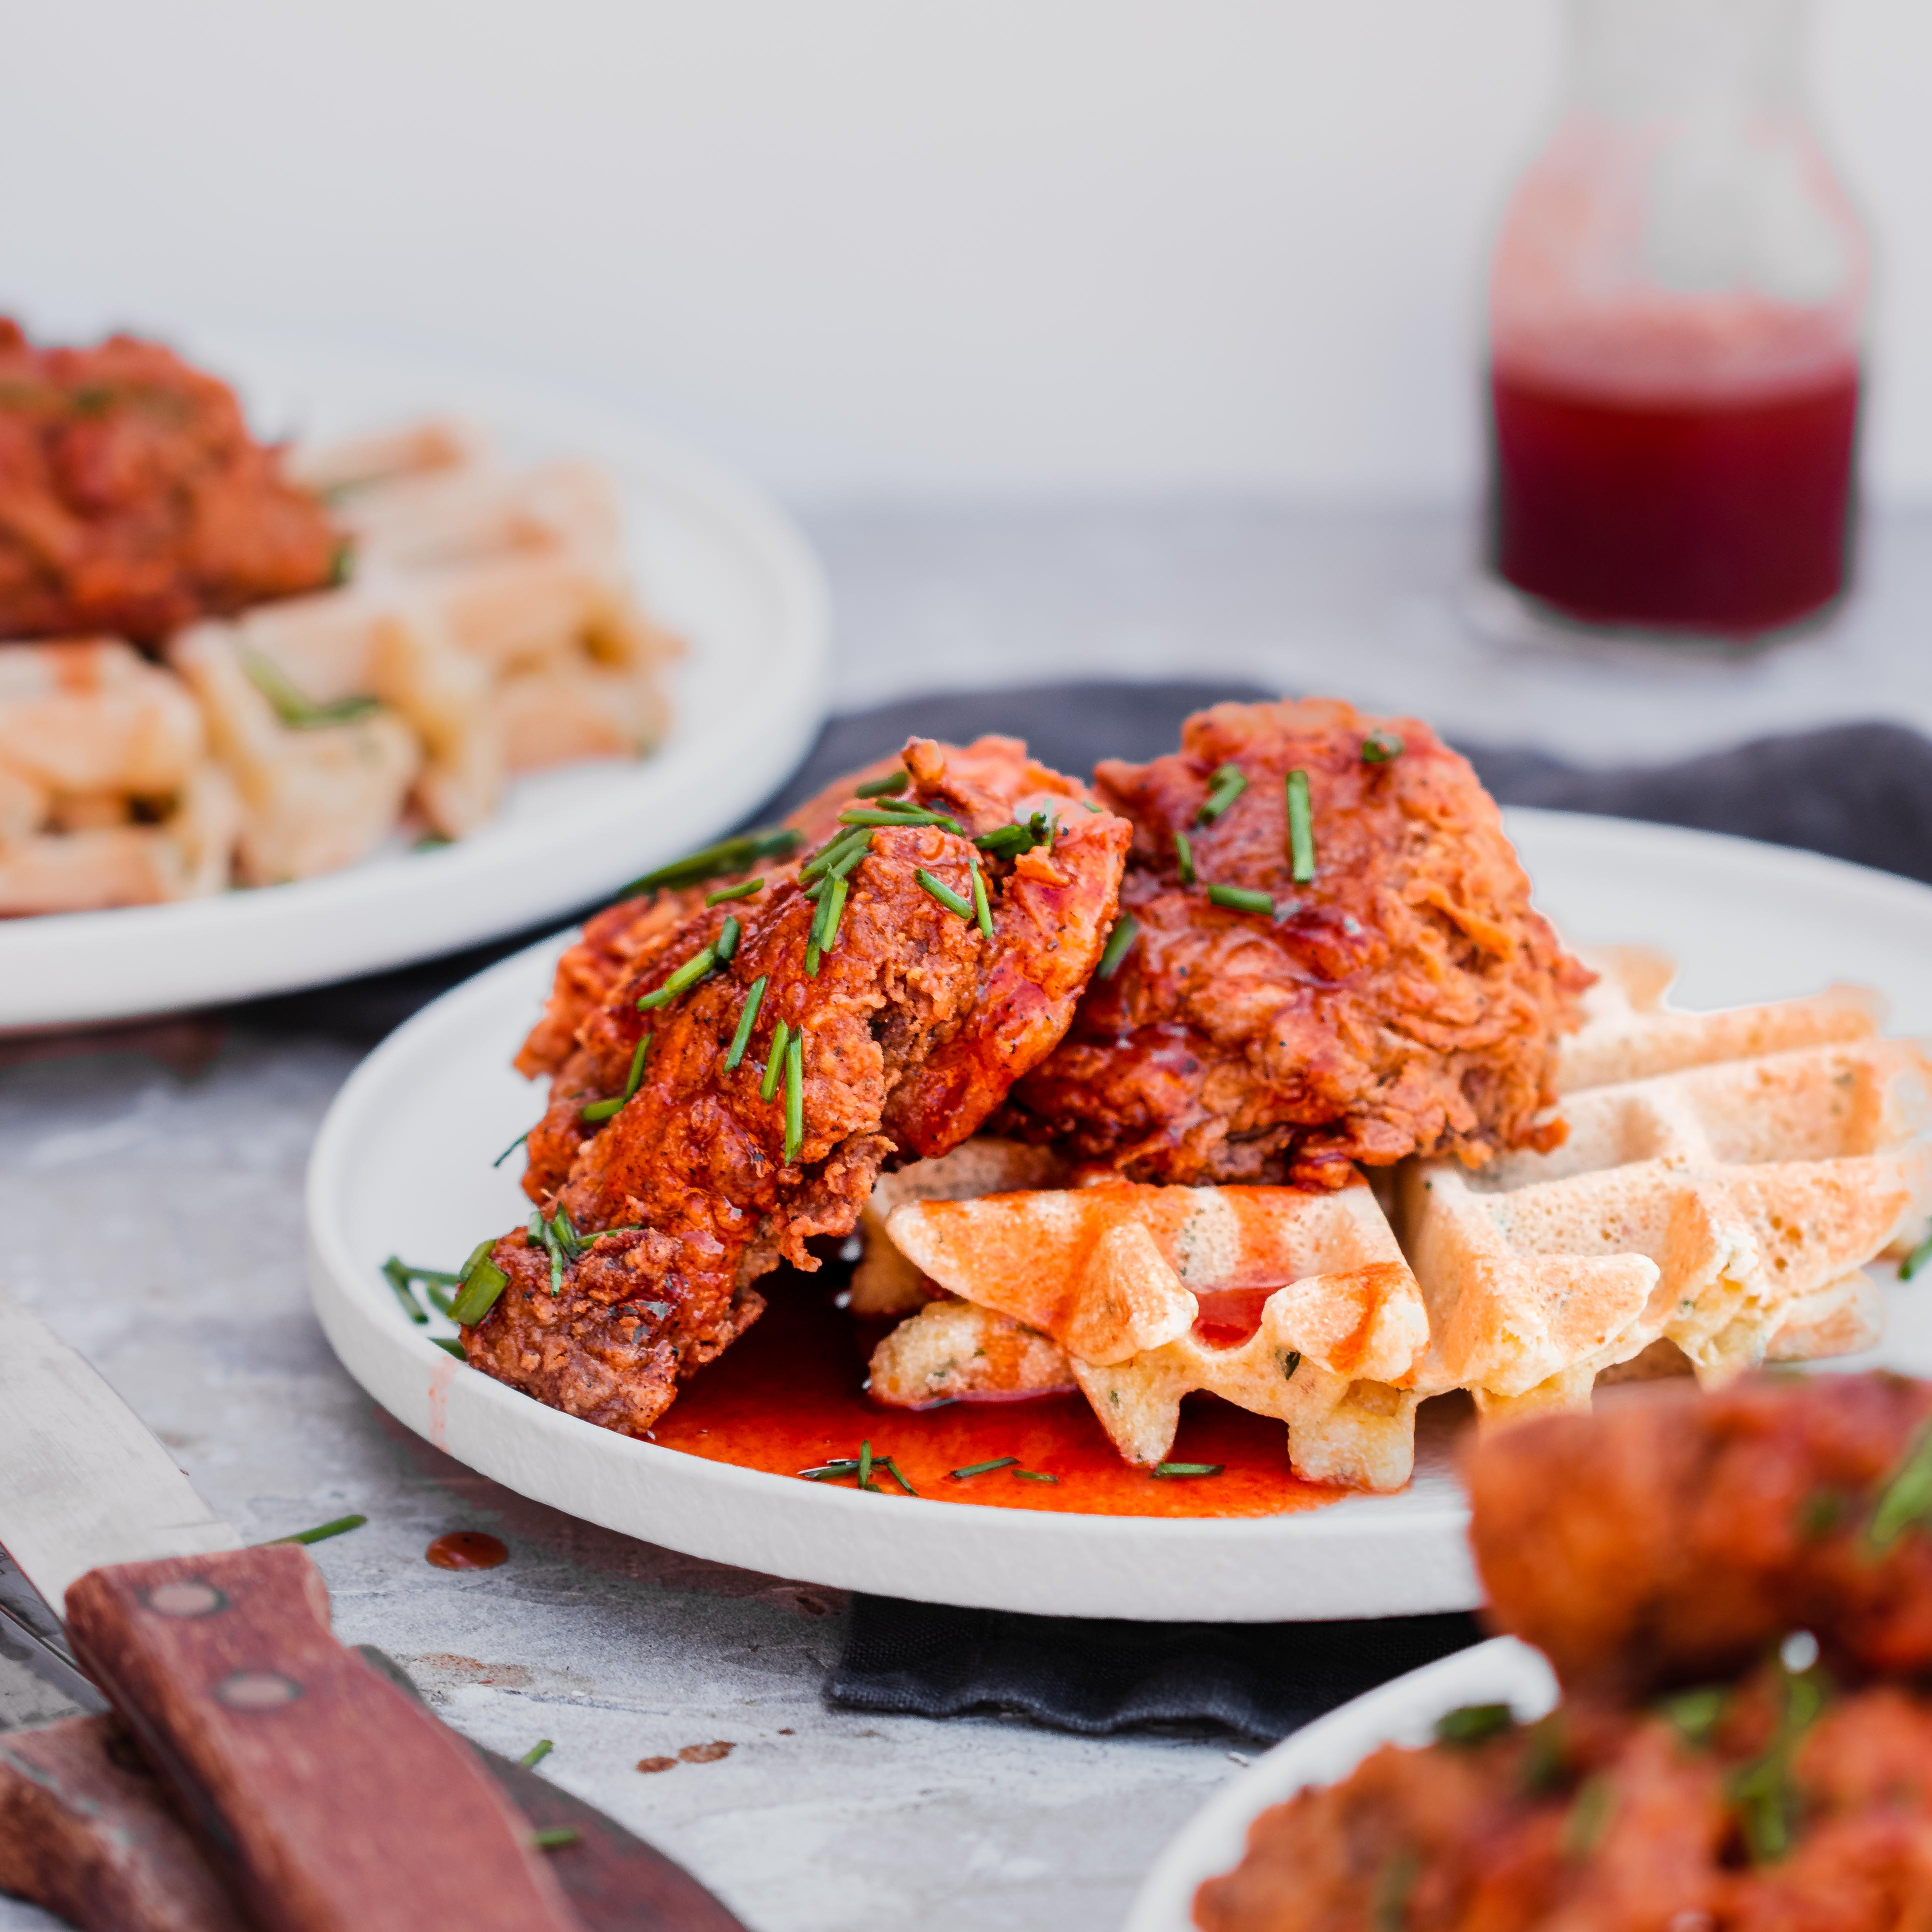 Vegan Chicken and Waffles